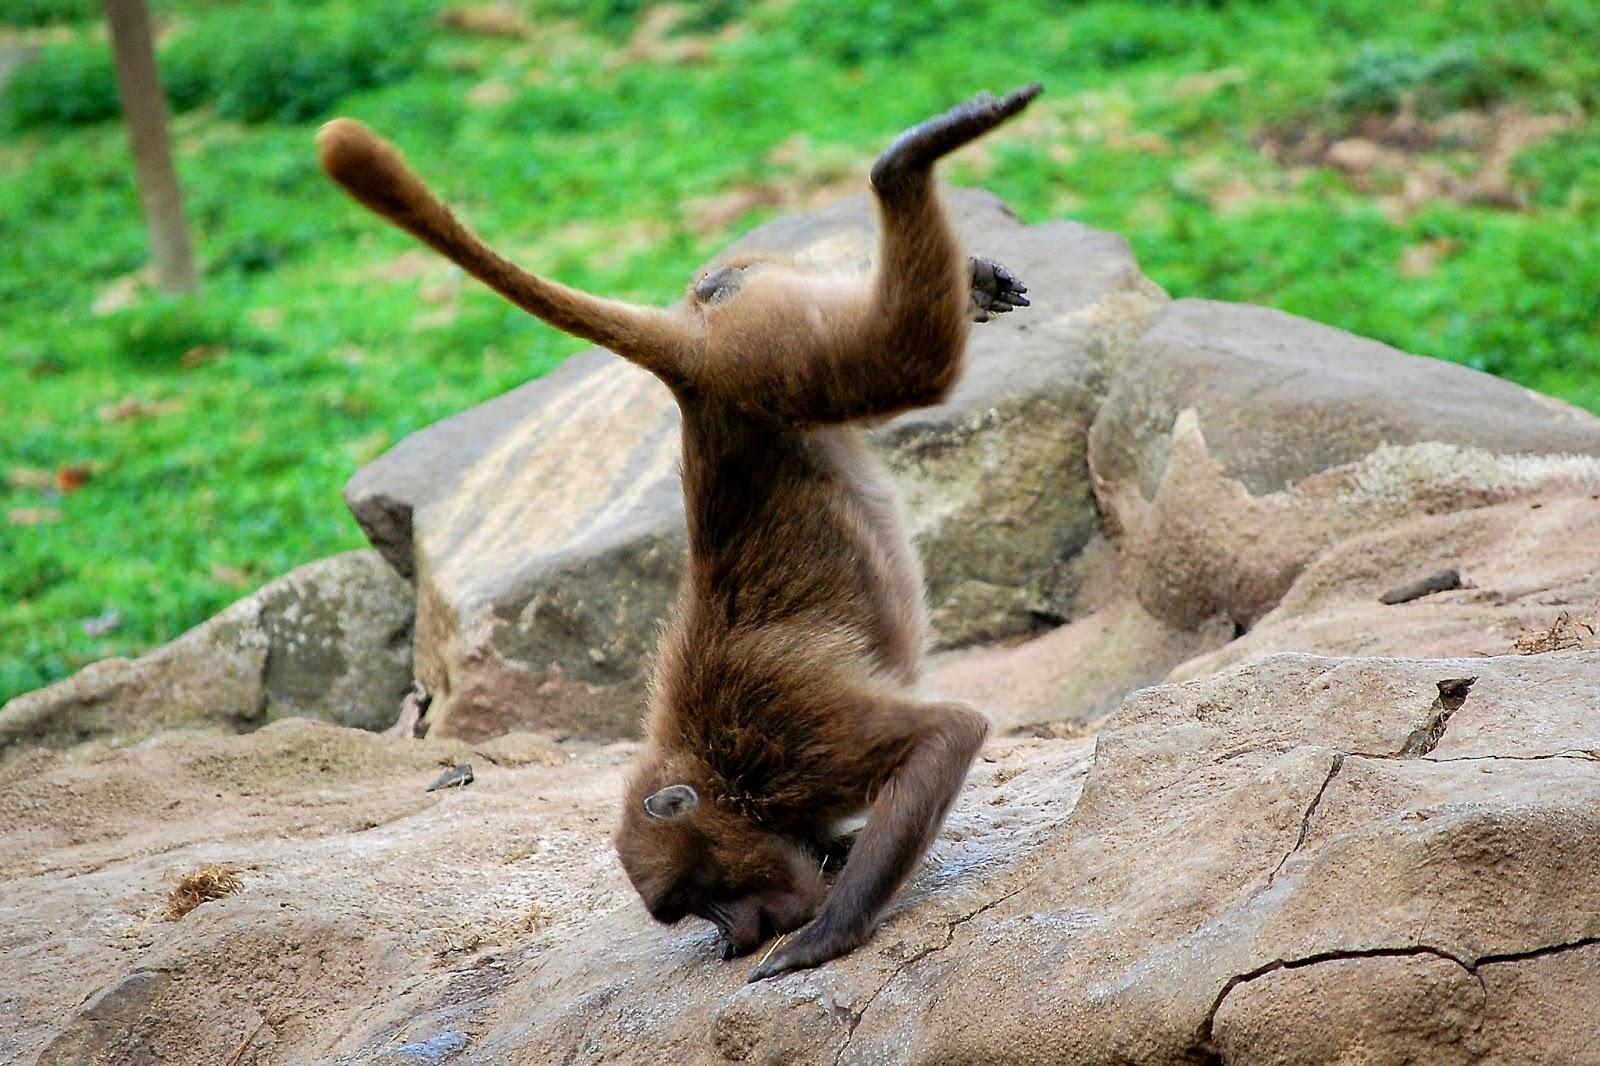 A breakdancing Gelado baboon